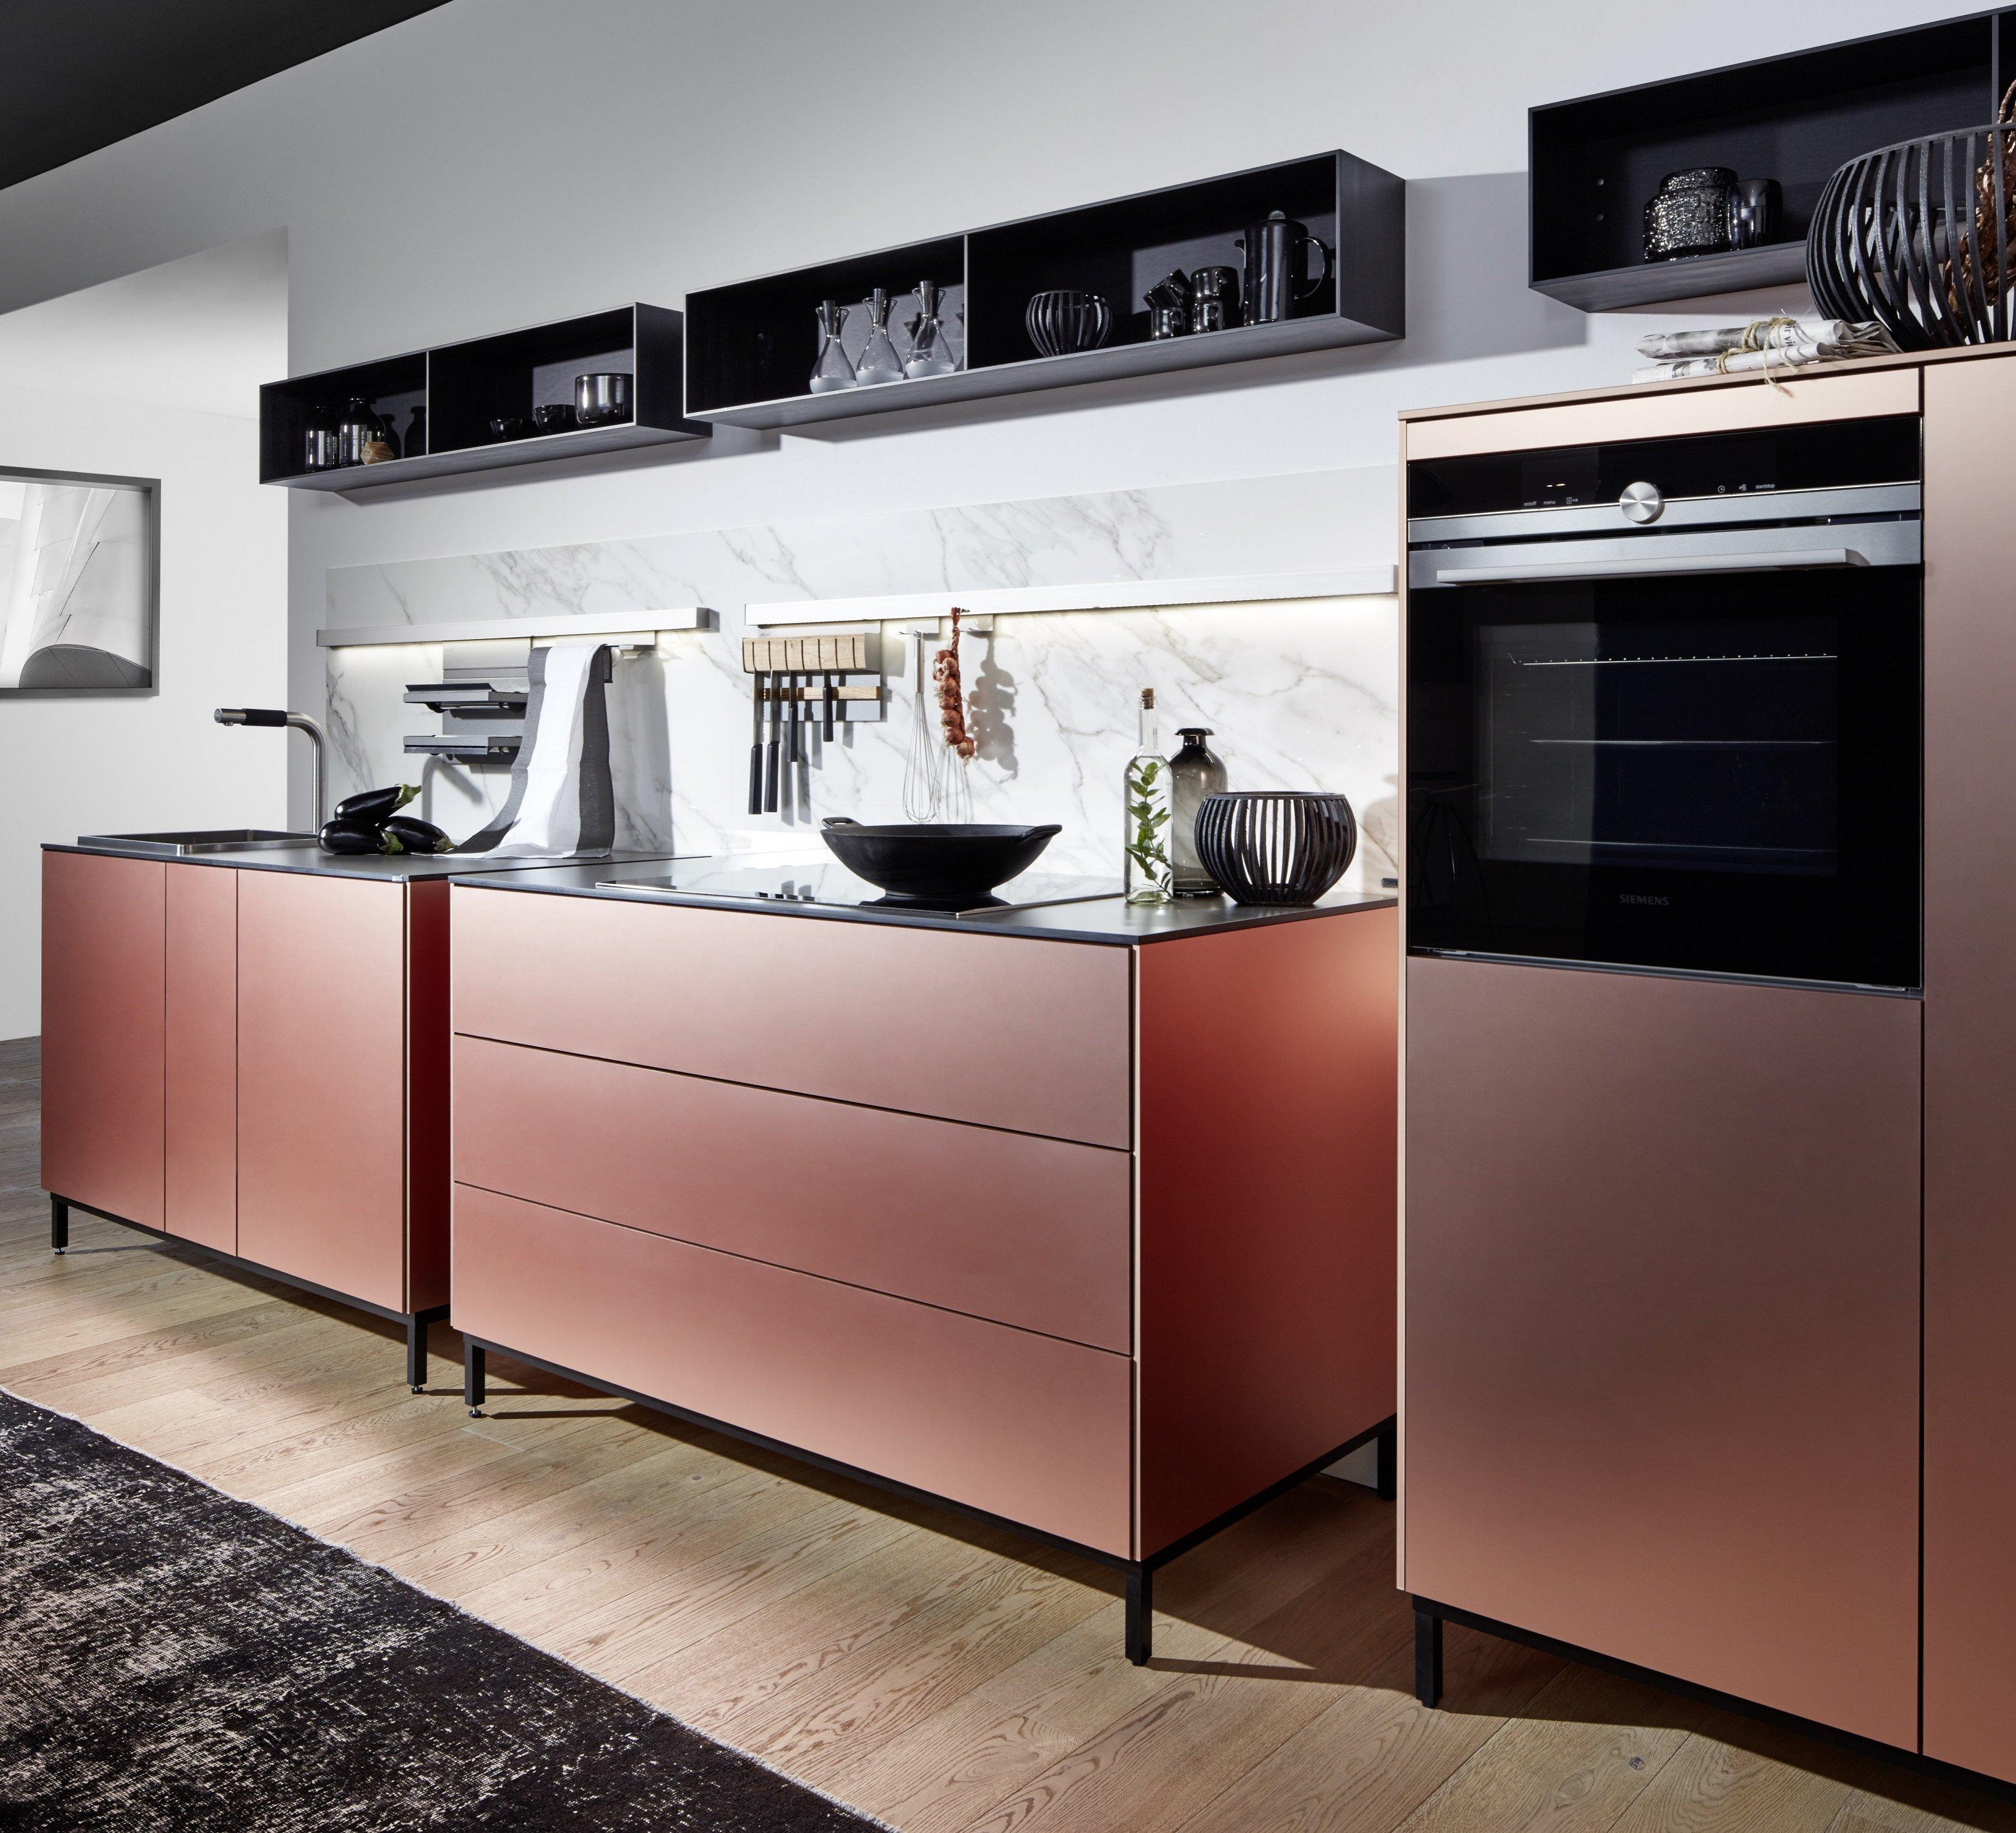 rode-keuken-showroom-witzand-bouwmaterialen